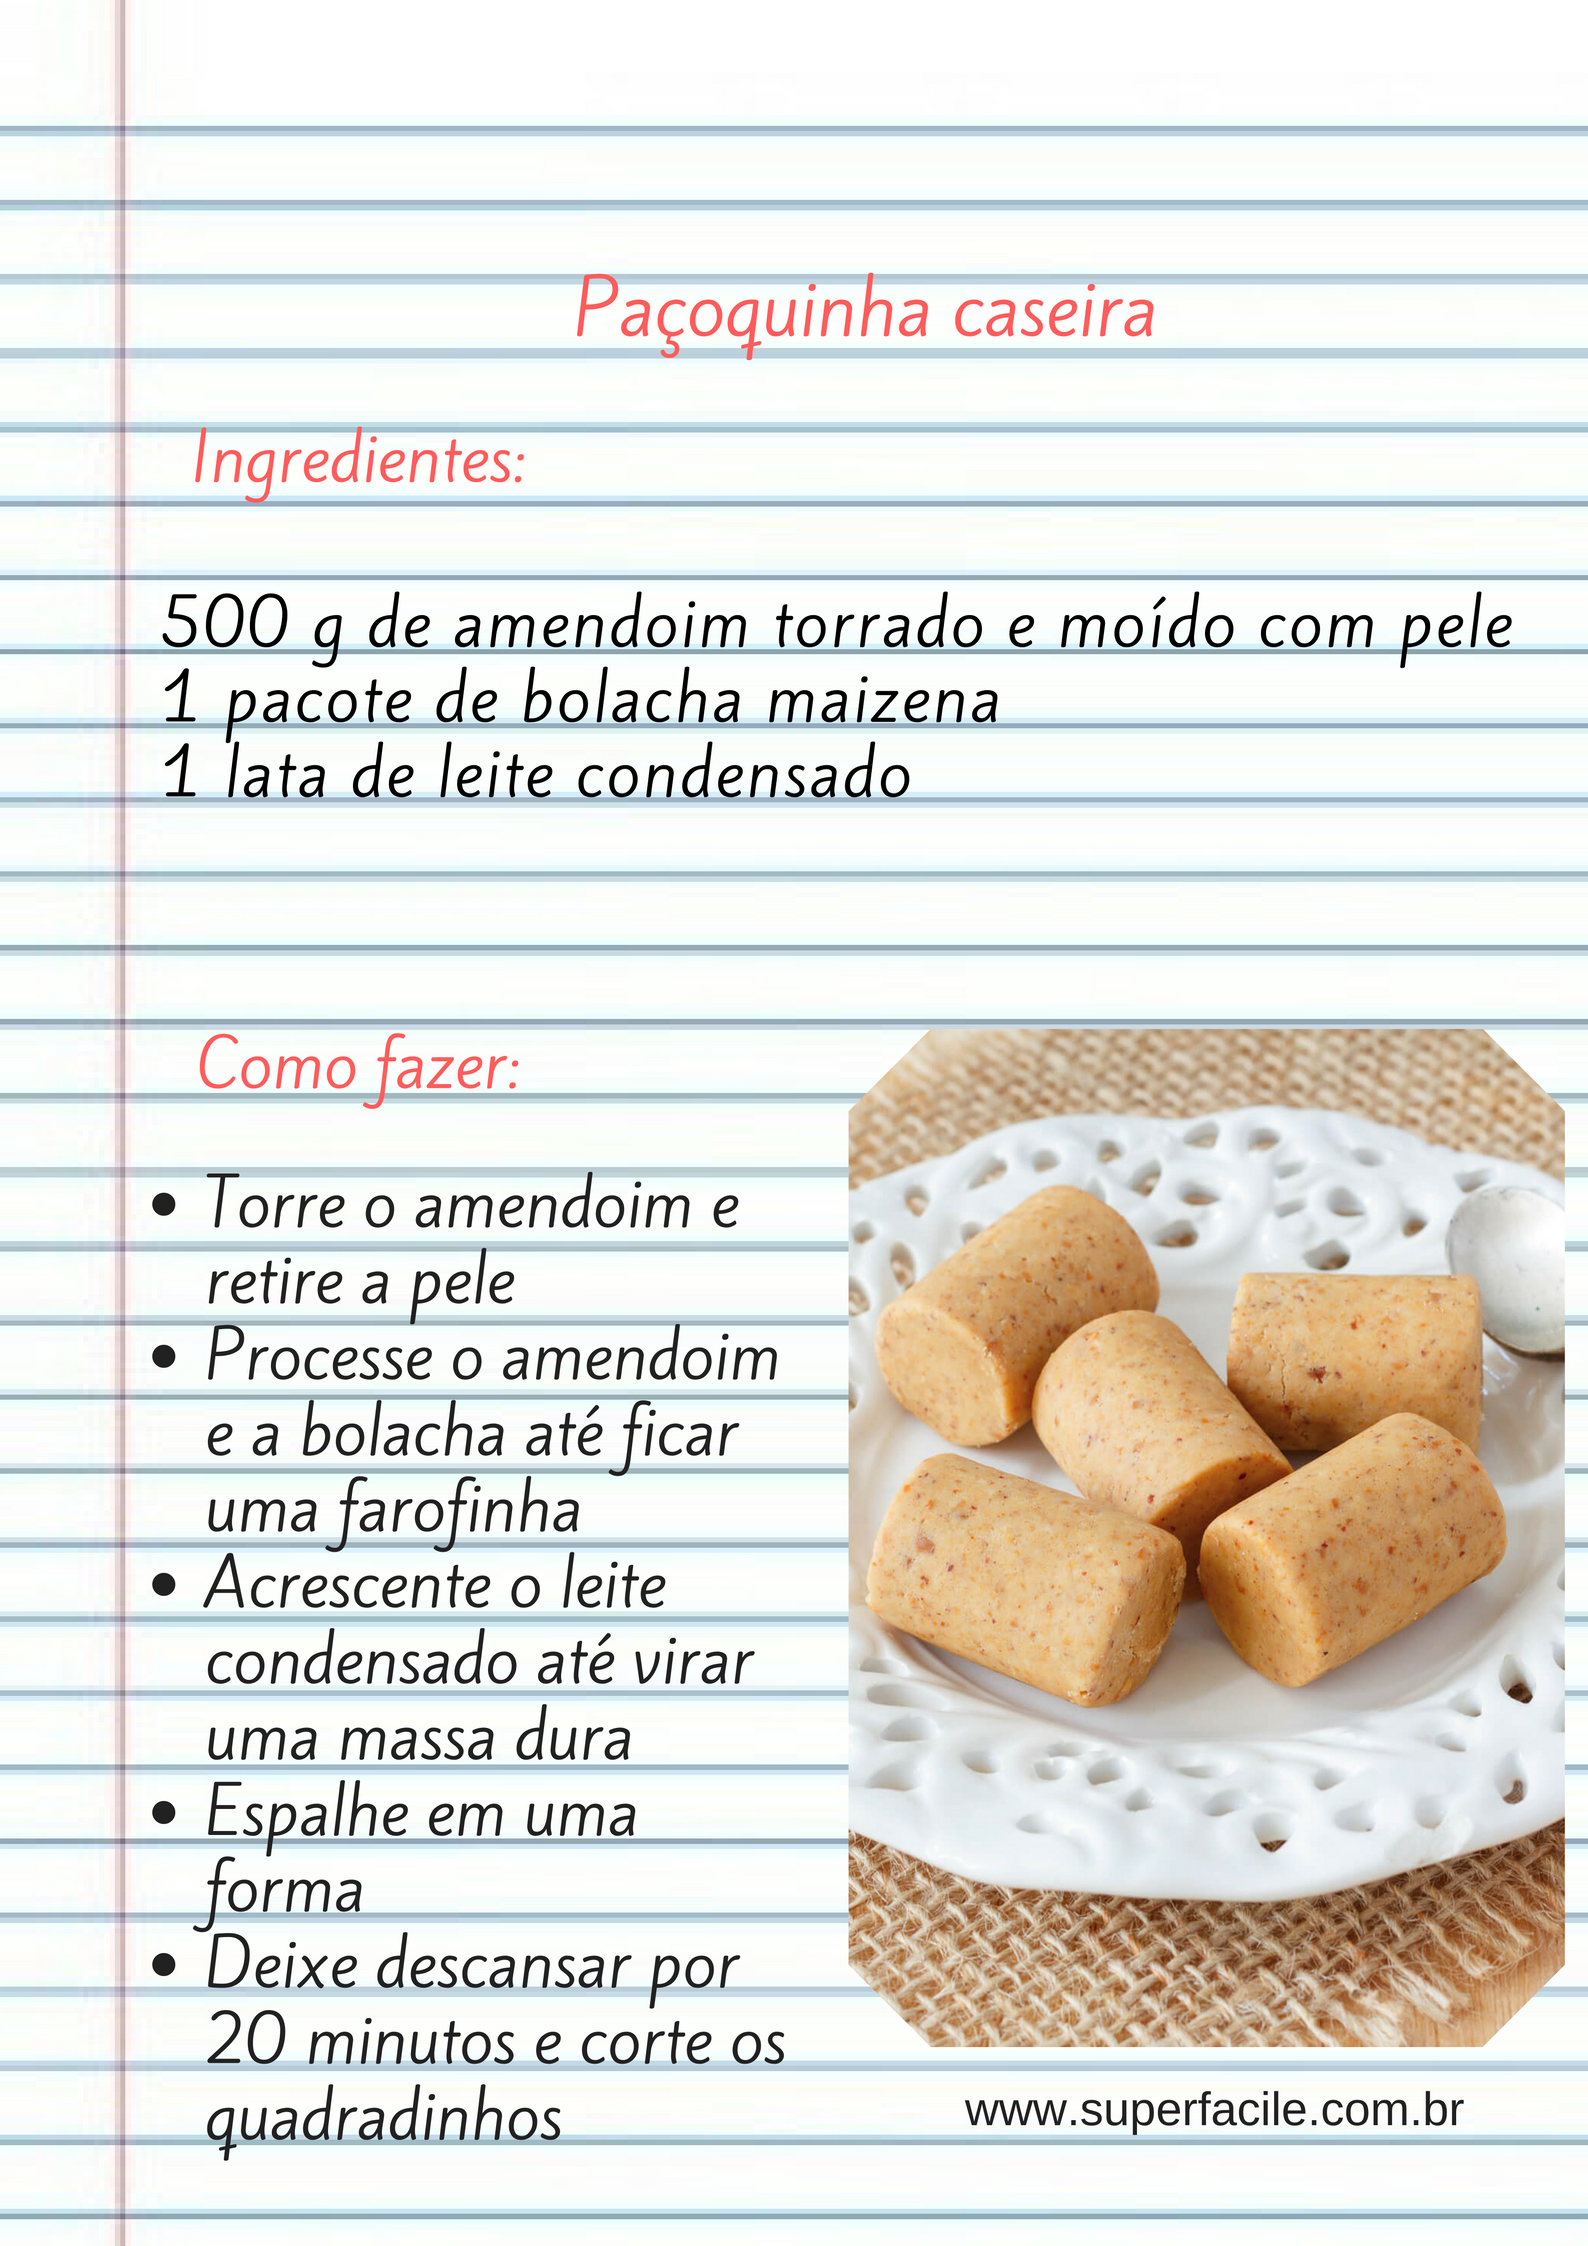 Paçoquinha Caseira #PaçoquinhaCaseira #Paçoquinha #DocesCaseiros #DocinhosFaceis #DocesFaceis #DocesPraticos #ReceitasFaceis #ReceitasPraticas #forkyeah #dailycortado#yahoofood #huffposttaste #buzzfeast #instafeast #bareaders #foodandwine #onthetable #vscofood #vscocook #foodstyling #beautifulcuisines #heresmyfood #theartofslowliving #rslove #realsimple #foodporn #cntravelereats #drinkwine